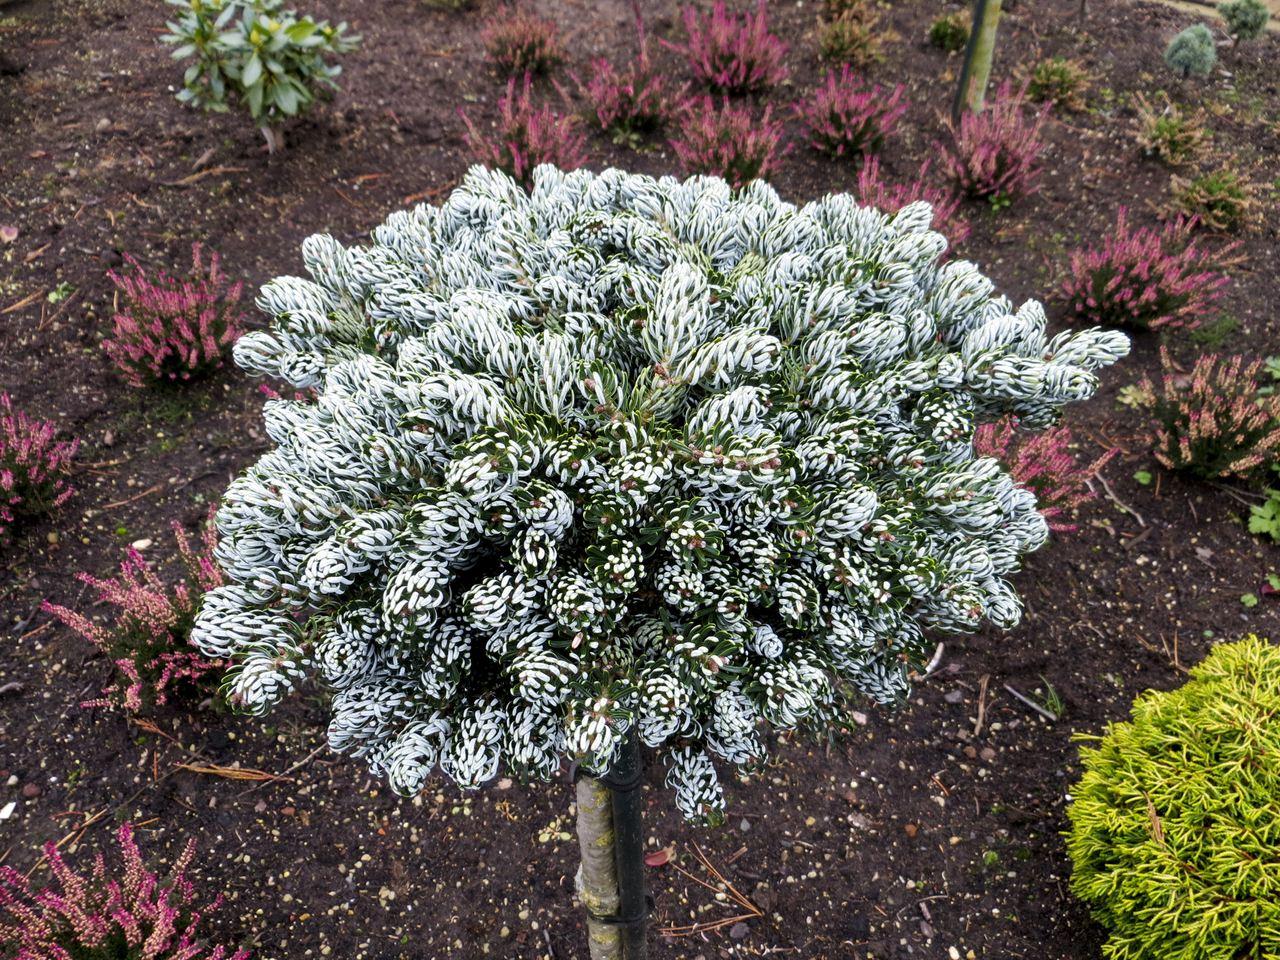 Abies koreana Icebreaker fir conifer evergreen Korean green white silver recurved needles miniature globose